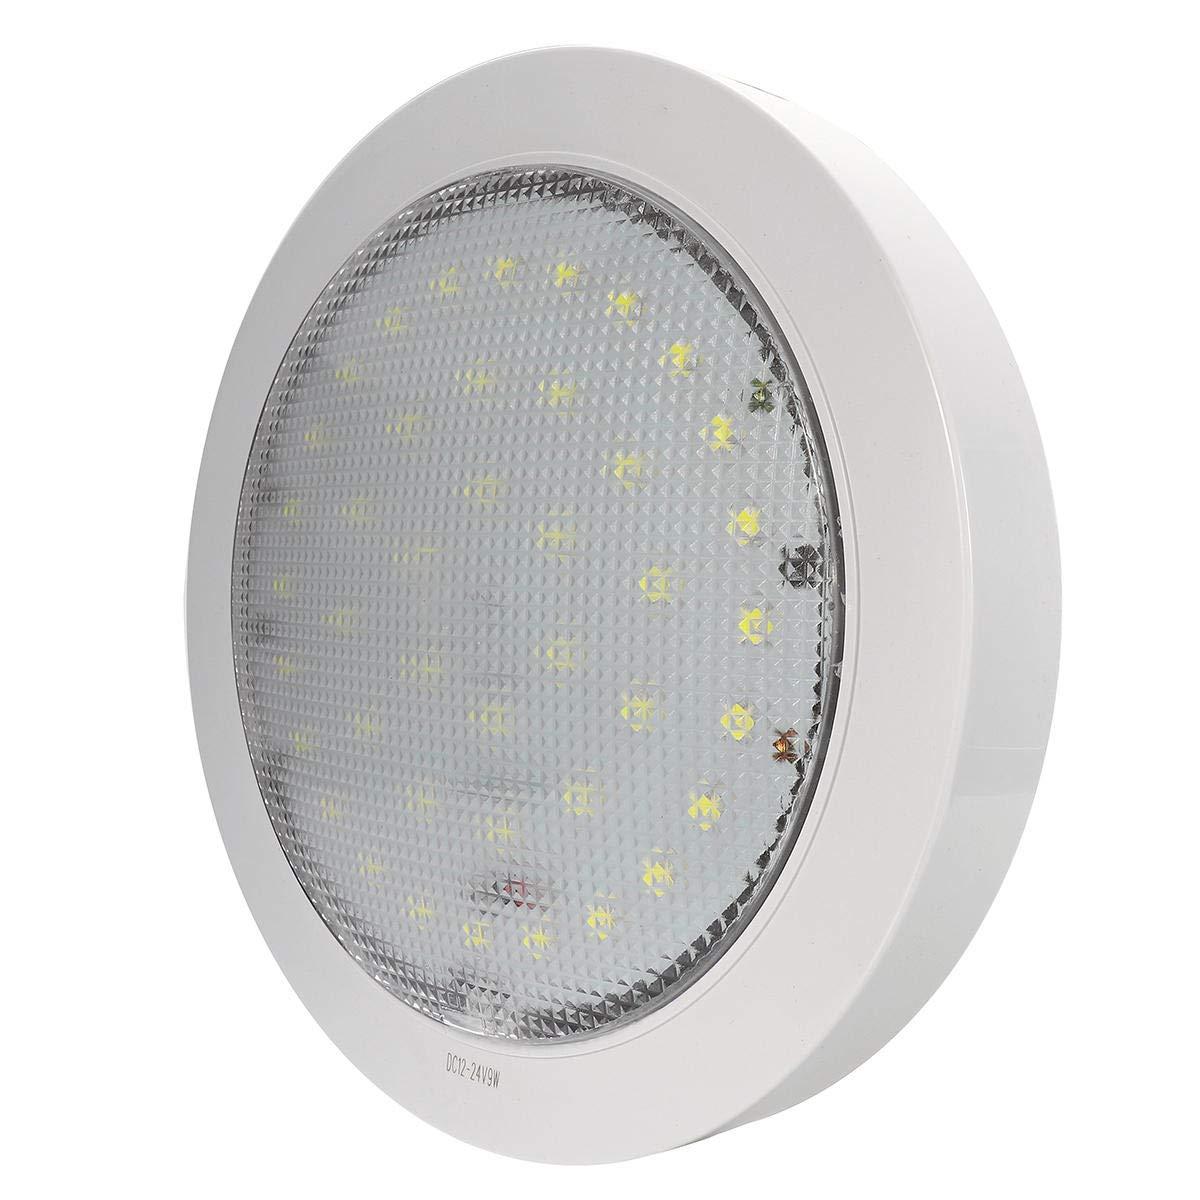 Plafonnier LED 12V-24V 5050 9W pour caravane//camping-car//remorque//bateau